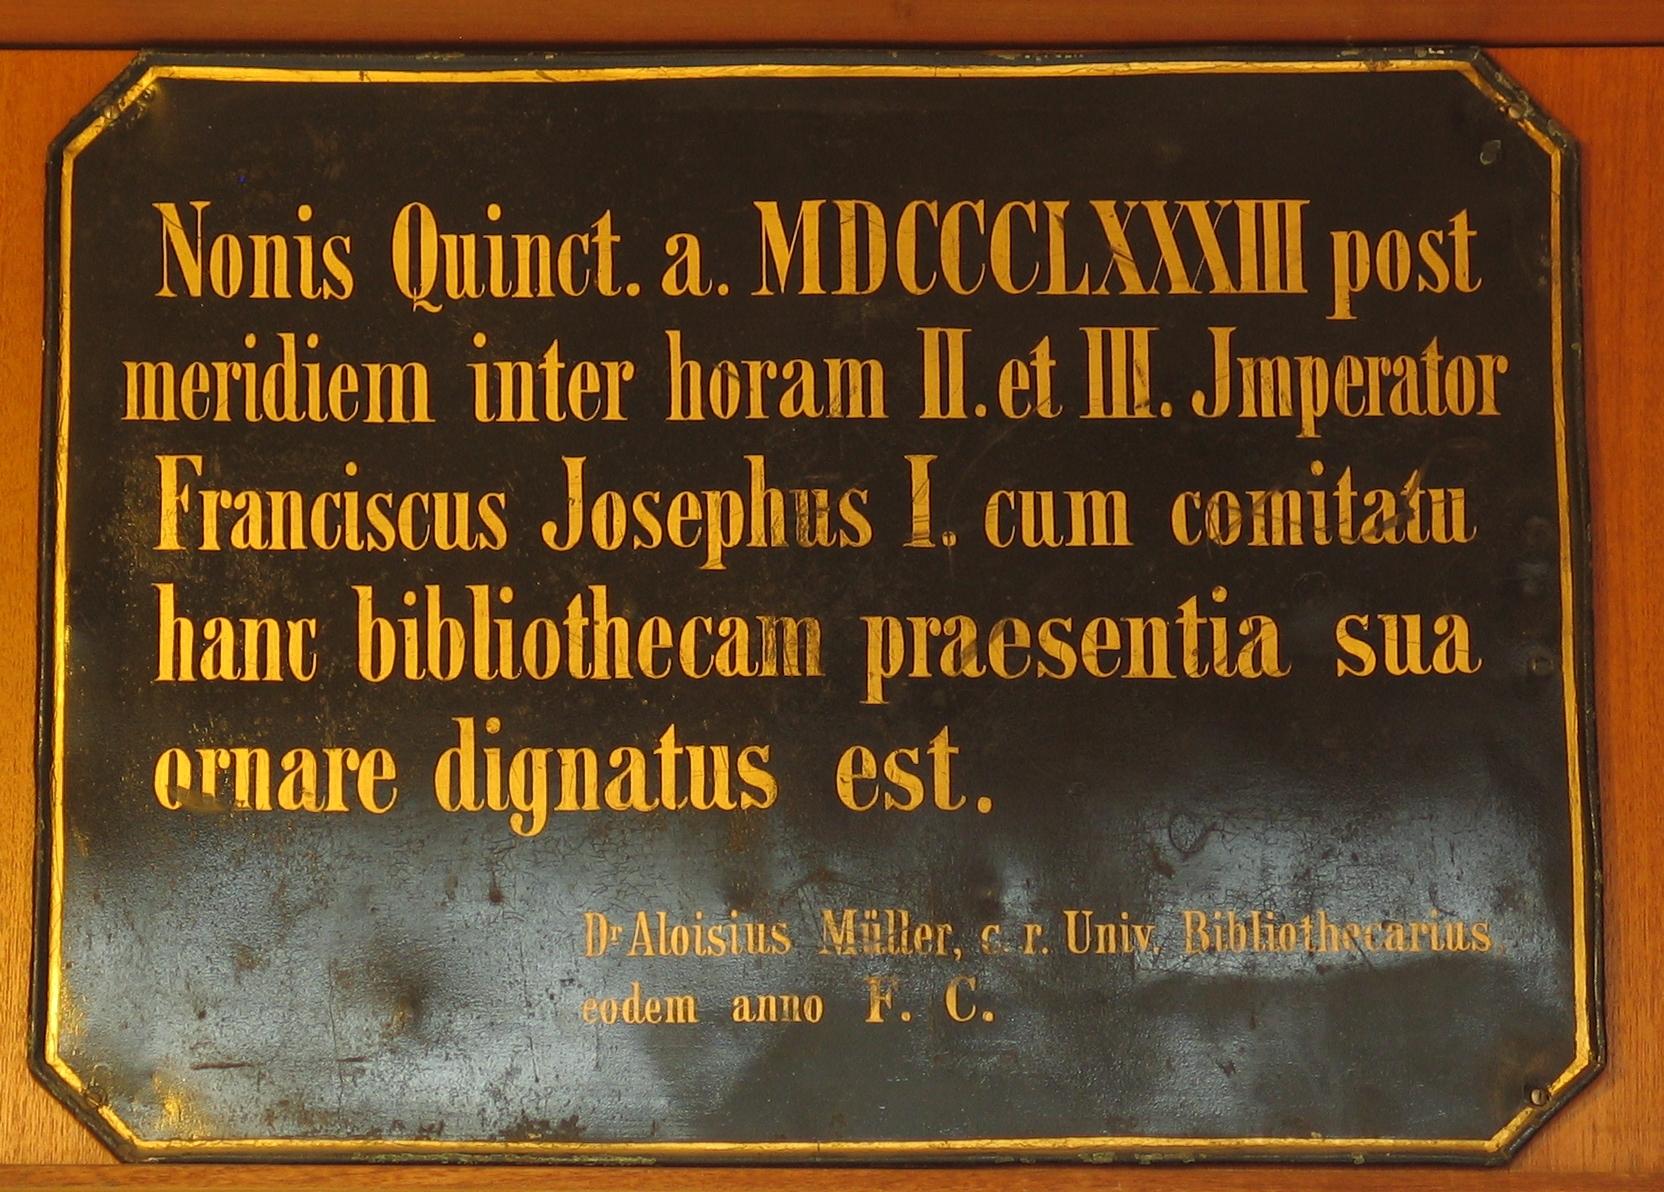 Latin_plaque_7_Jul_1883.jpg